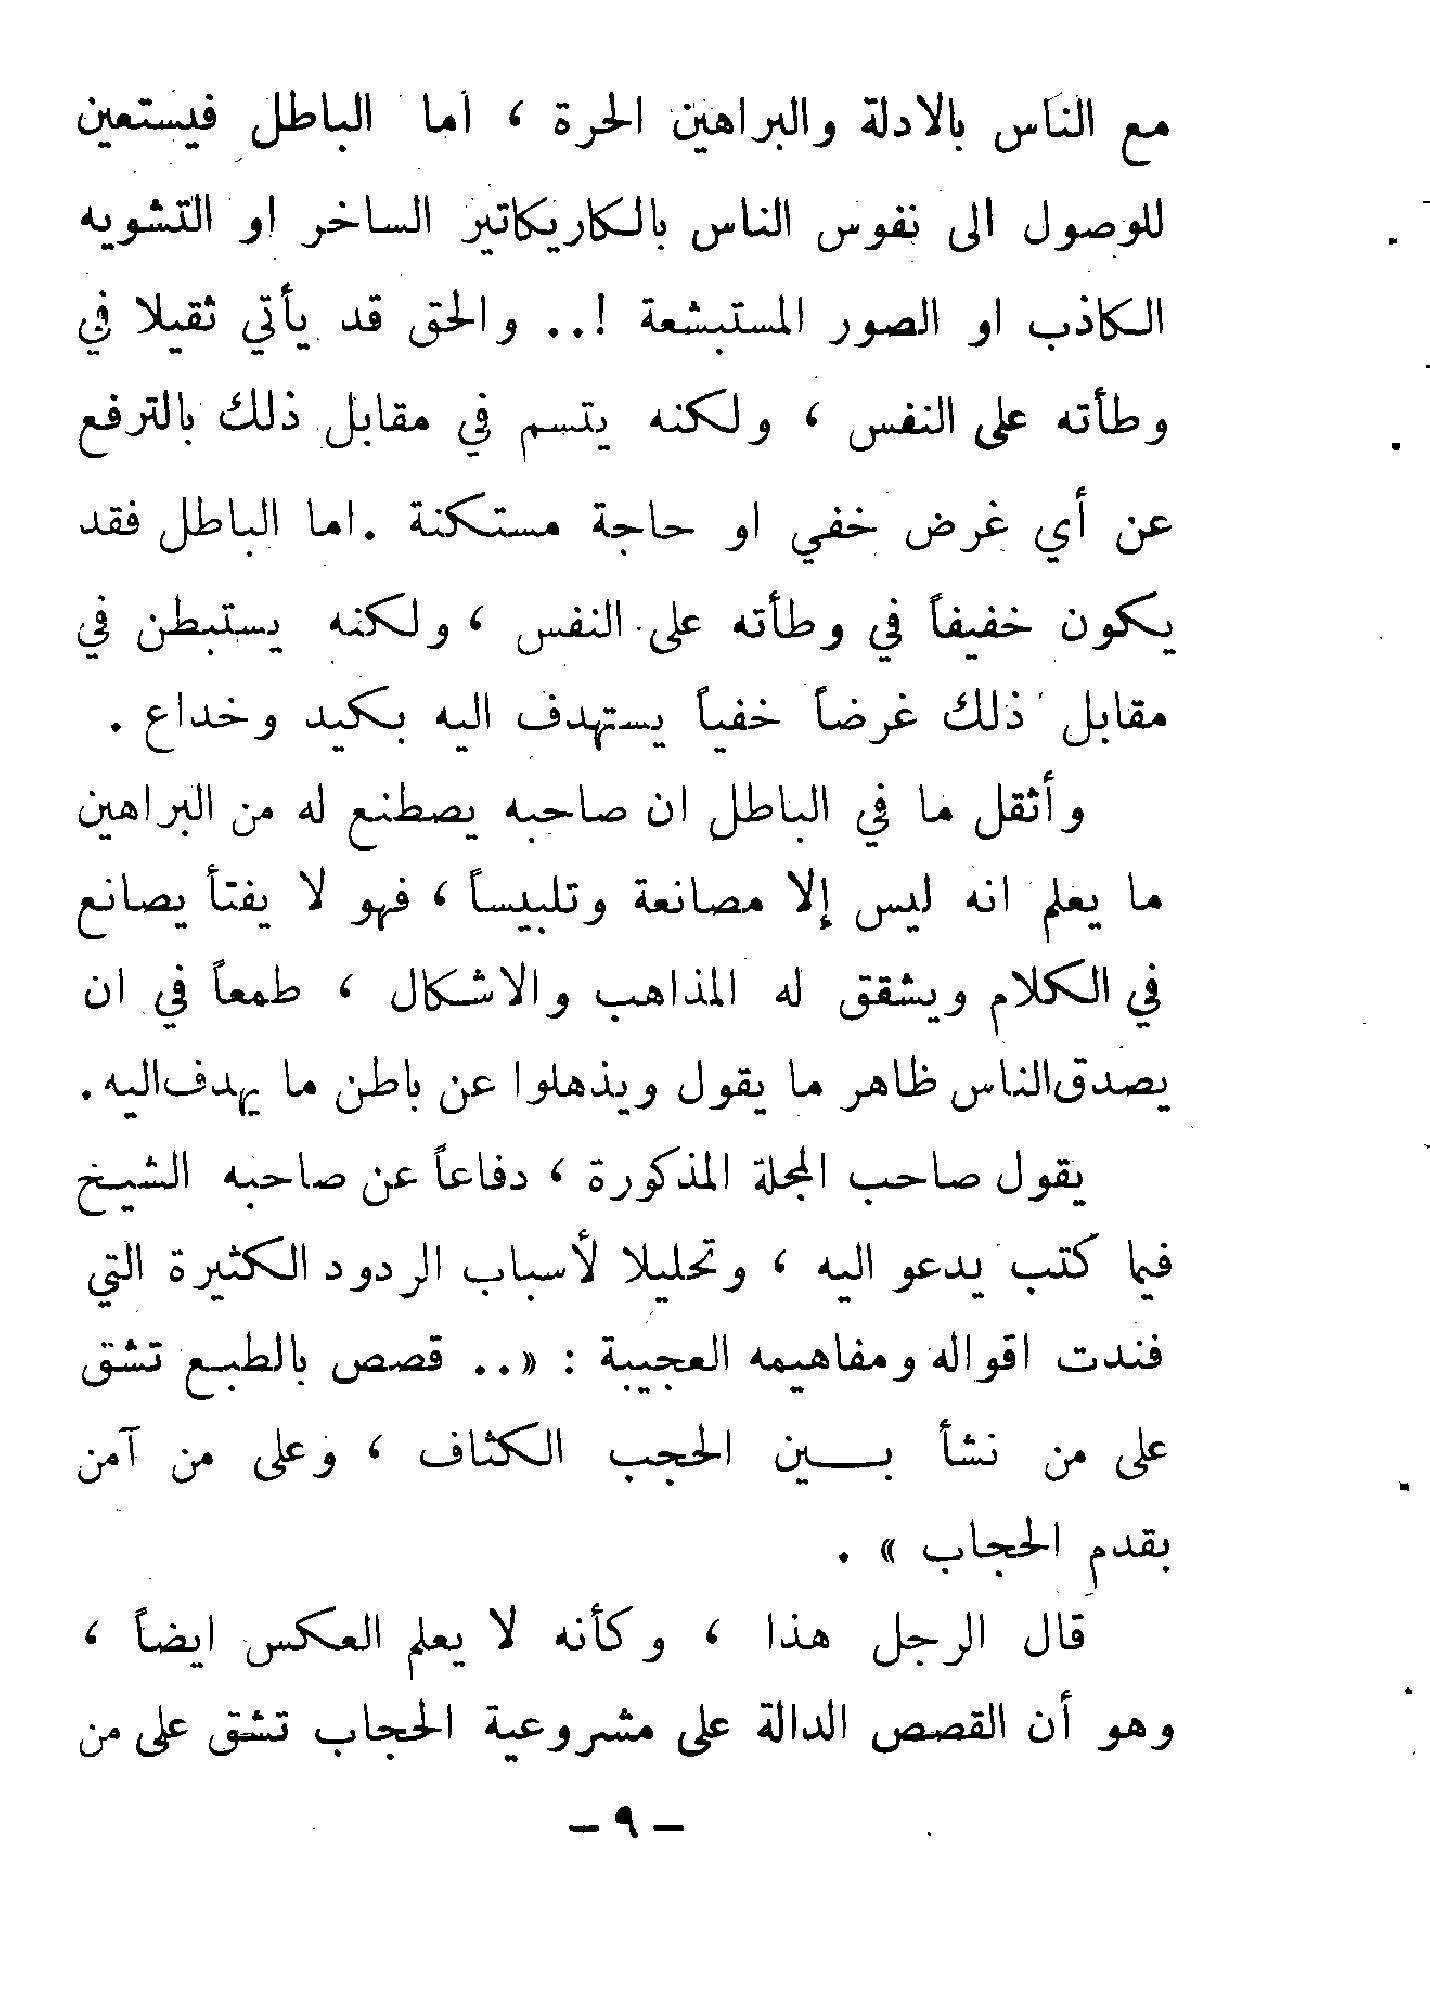 مكتبة محمد سعيد رمضان البوطي رحمه الله Matnawi Free Download Borrow And Streaming Internet Archive Islamic Inspirational Quotes Inspirational Quotes Quotes